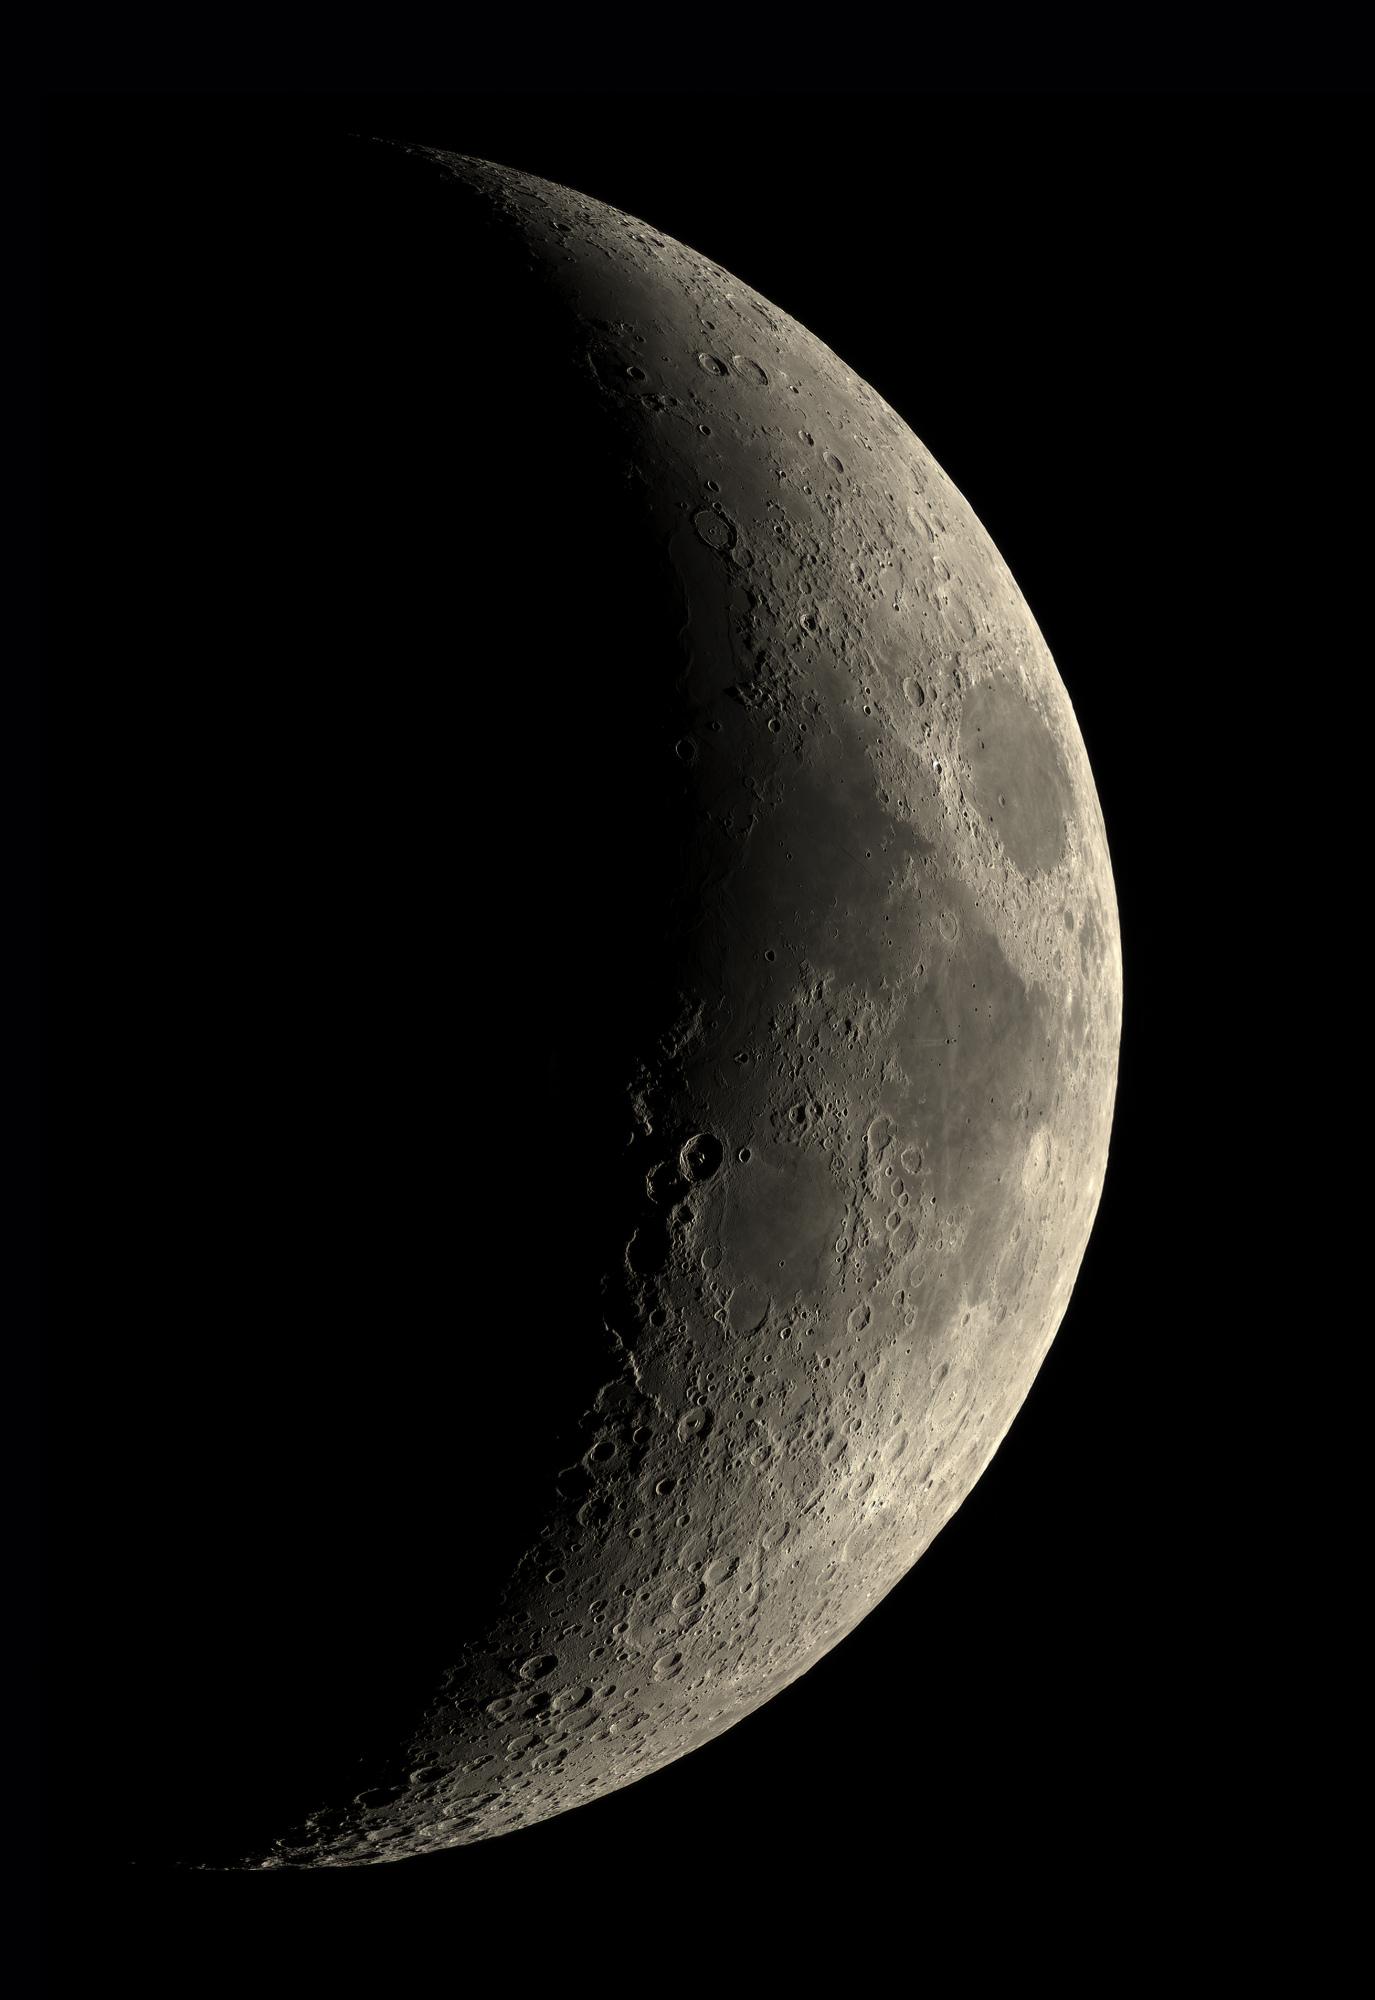 5ed165d58663e_lune270520(C8-Foyer-70)c.thumb.jpg.51cd3f2ecb95758319f6b7e7bb8dcbe5.jpg